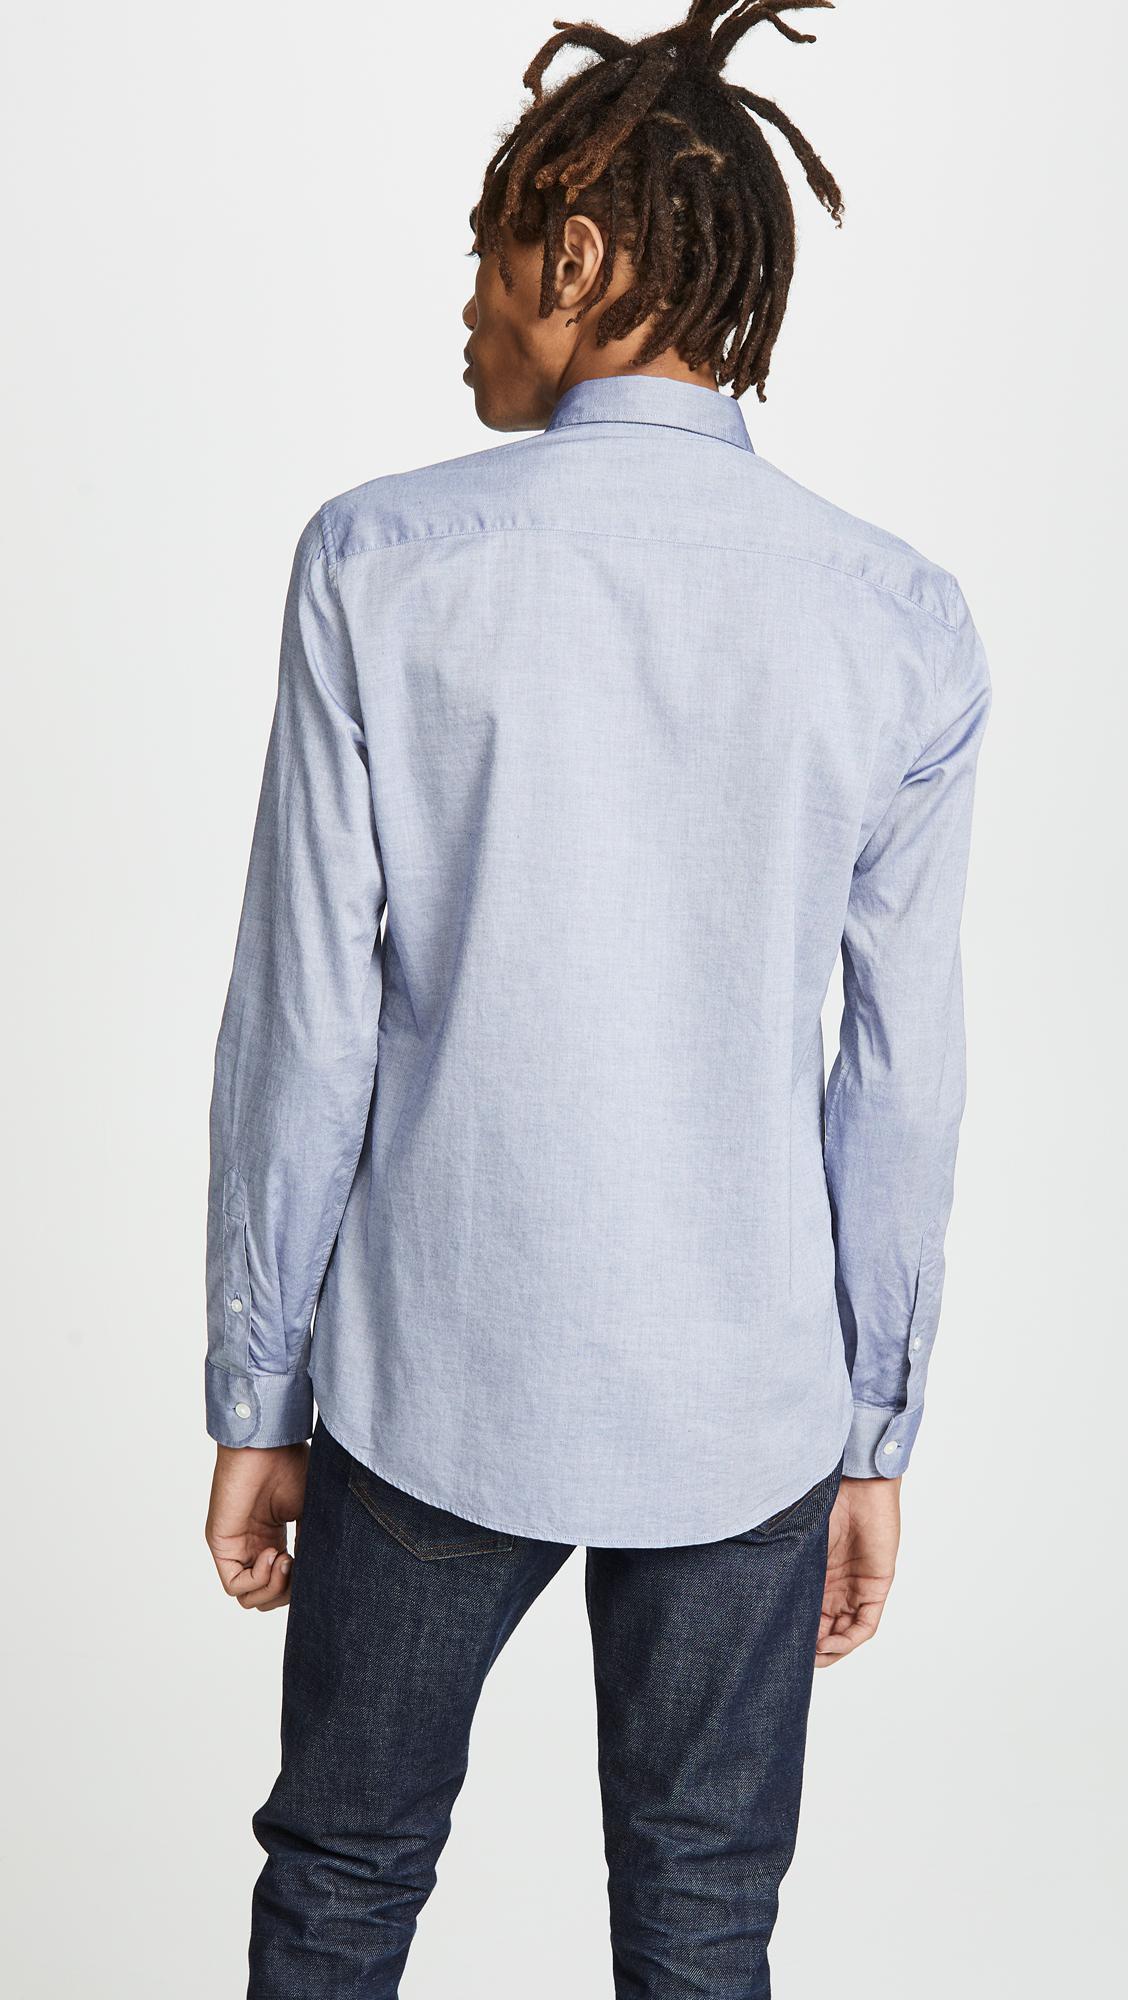 9d013f97 KENZO - Blue Eye Crest Slim Fit Shirt for Men - Lyst. View fullscreen